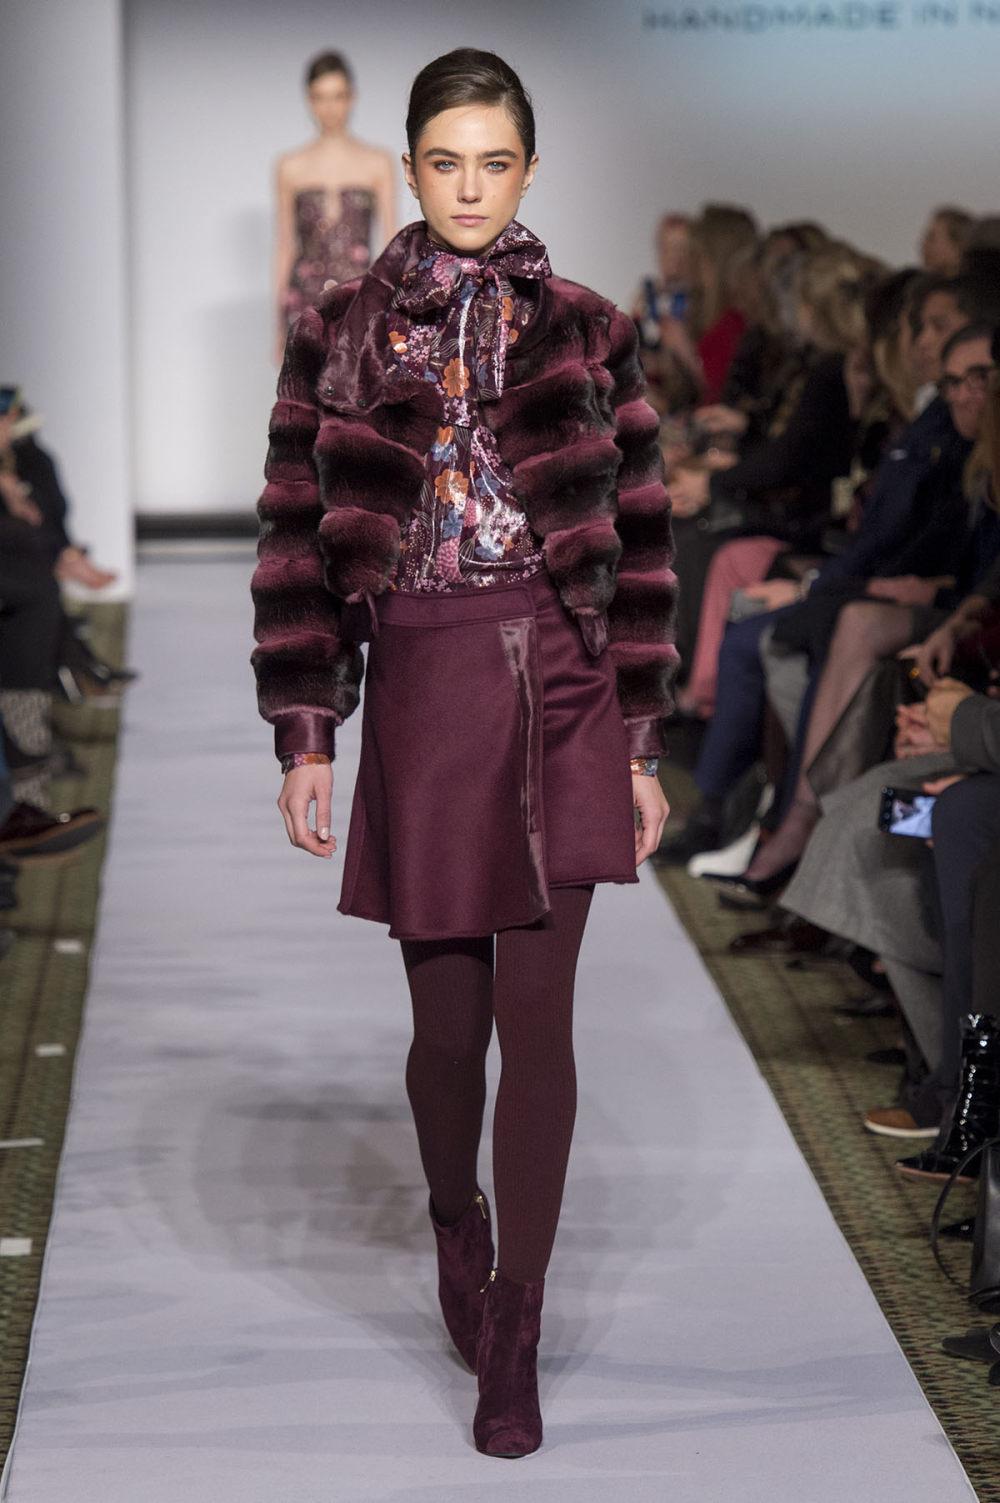 Carolina Herrera时装系列用鲜艳的颜色充满智能的黑白色调-25.jpg